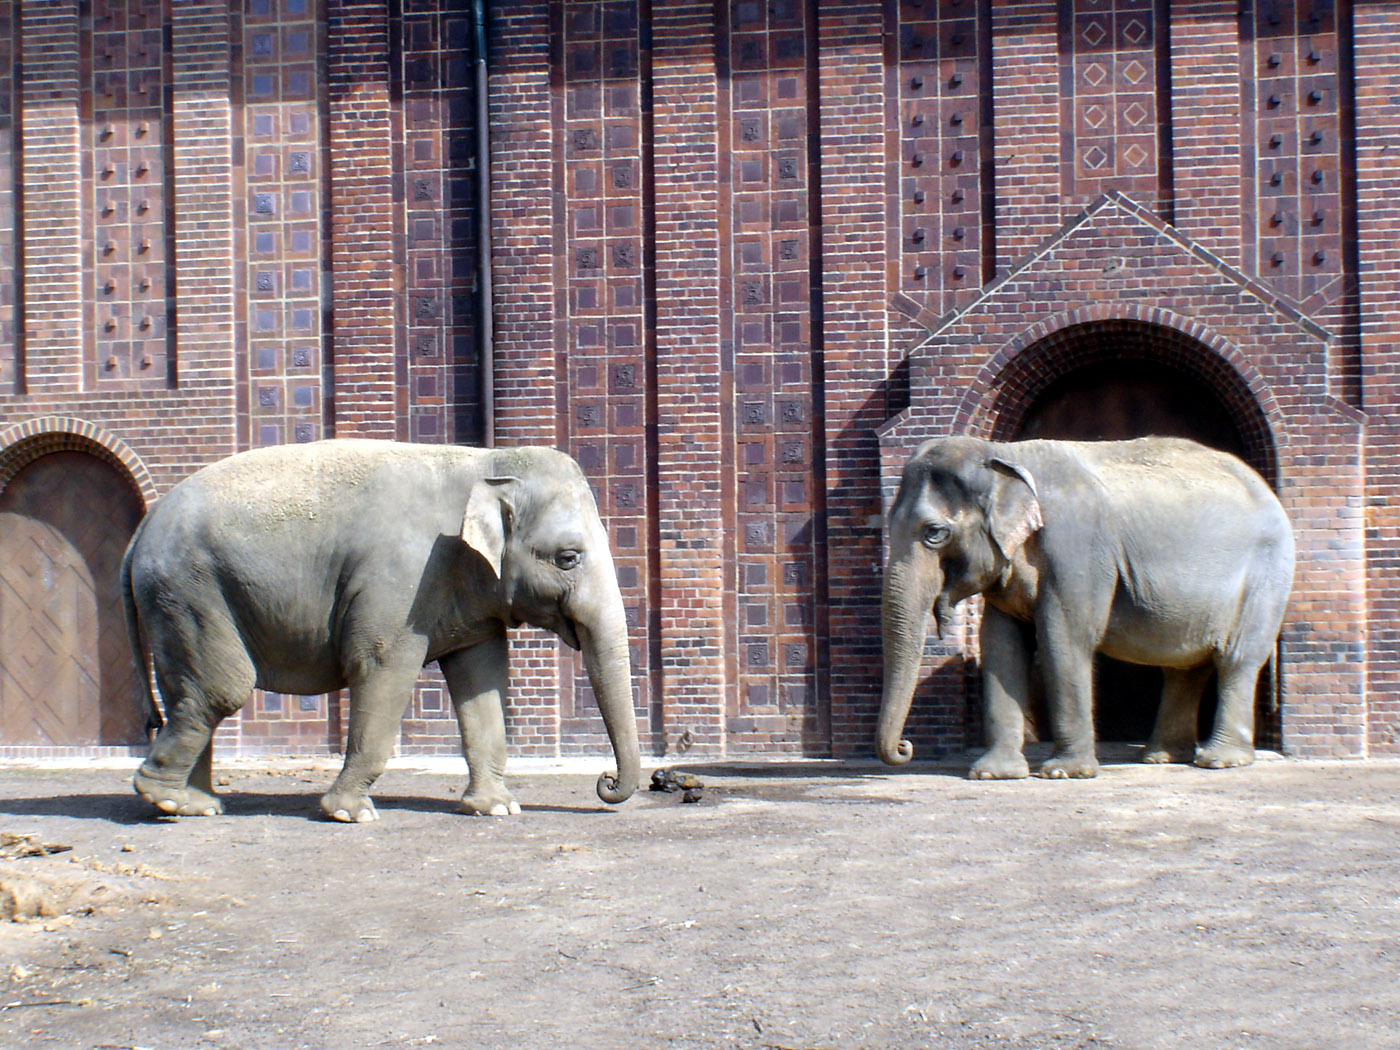 Hd wallpaper elephant - Elefant Page 3